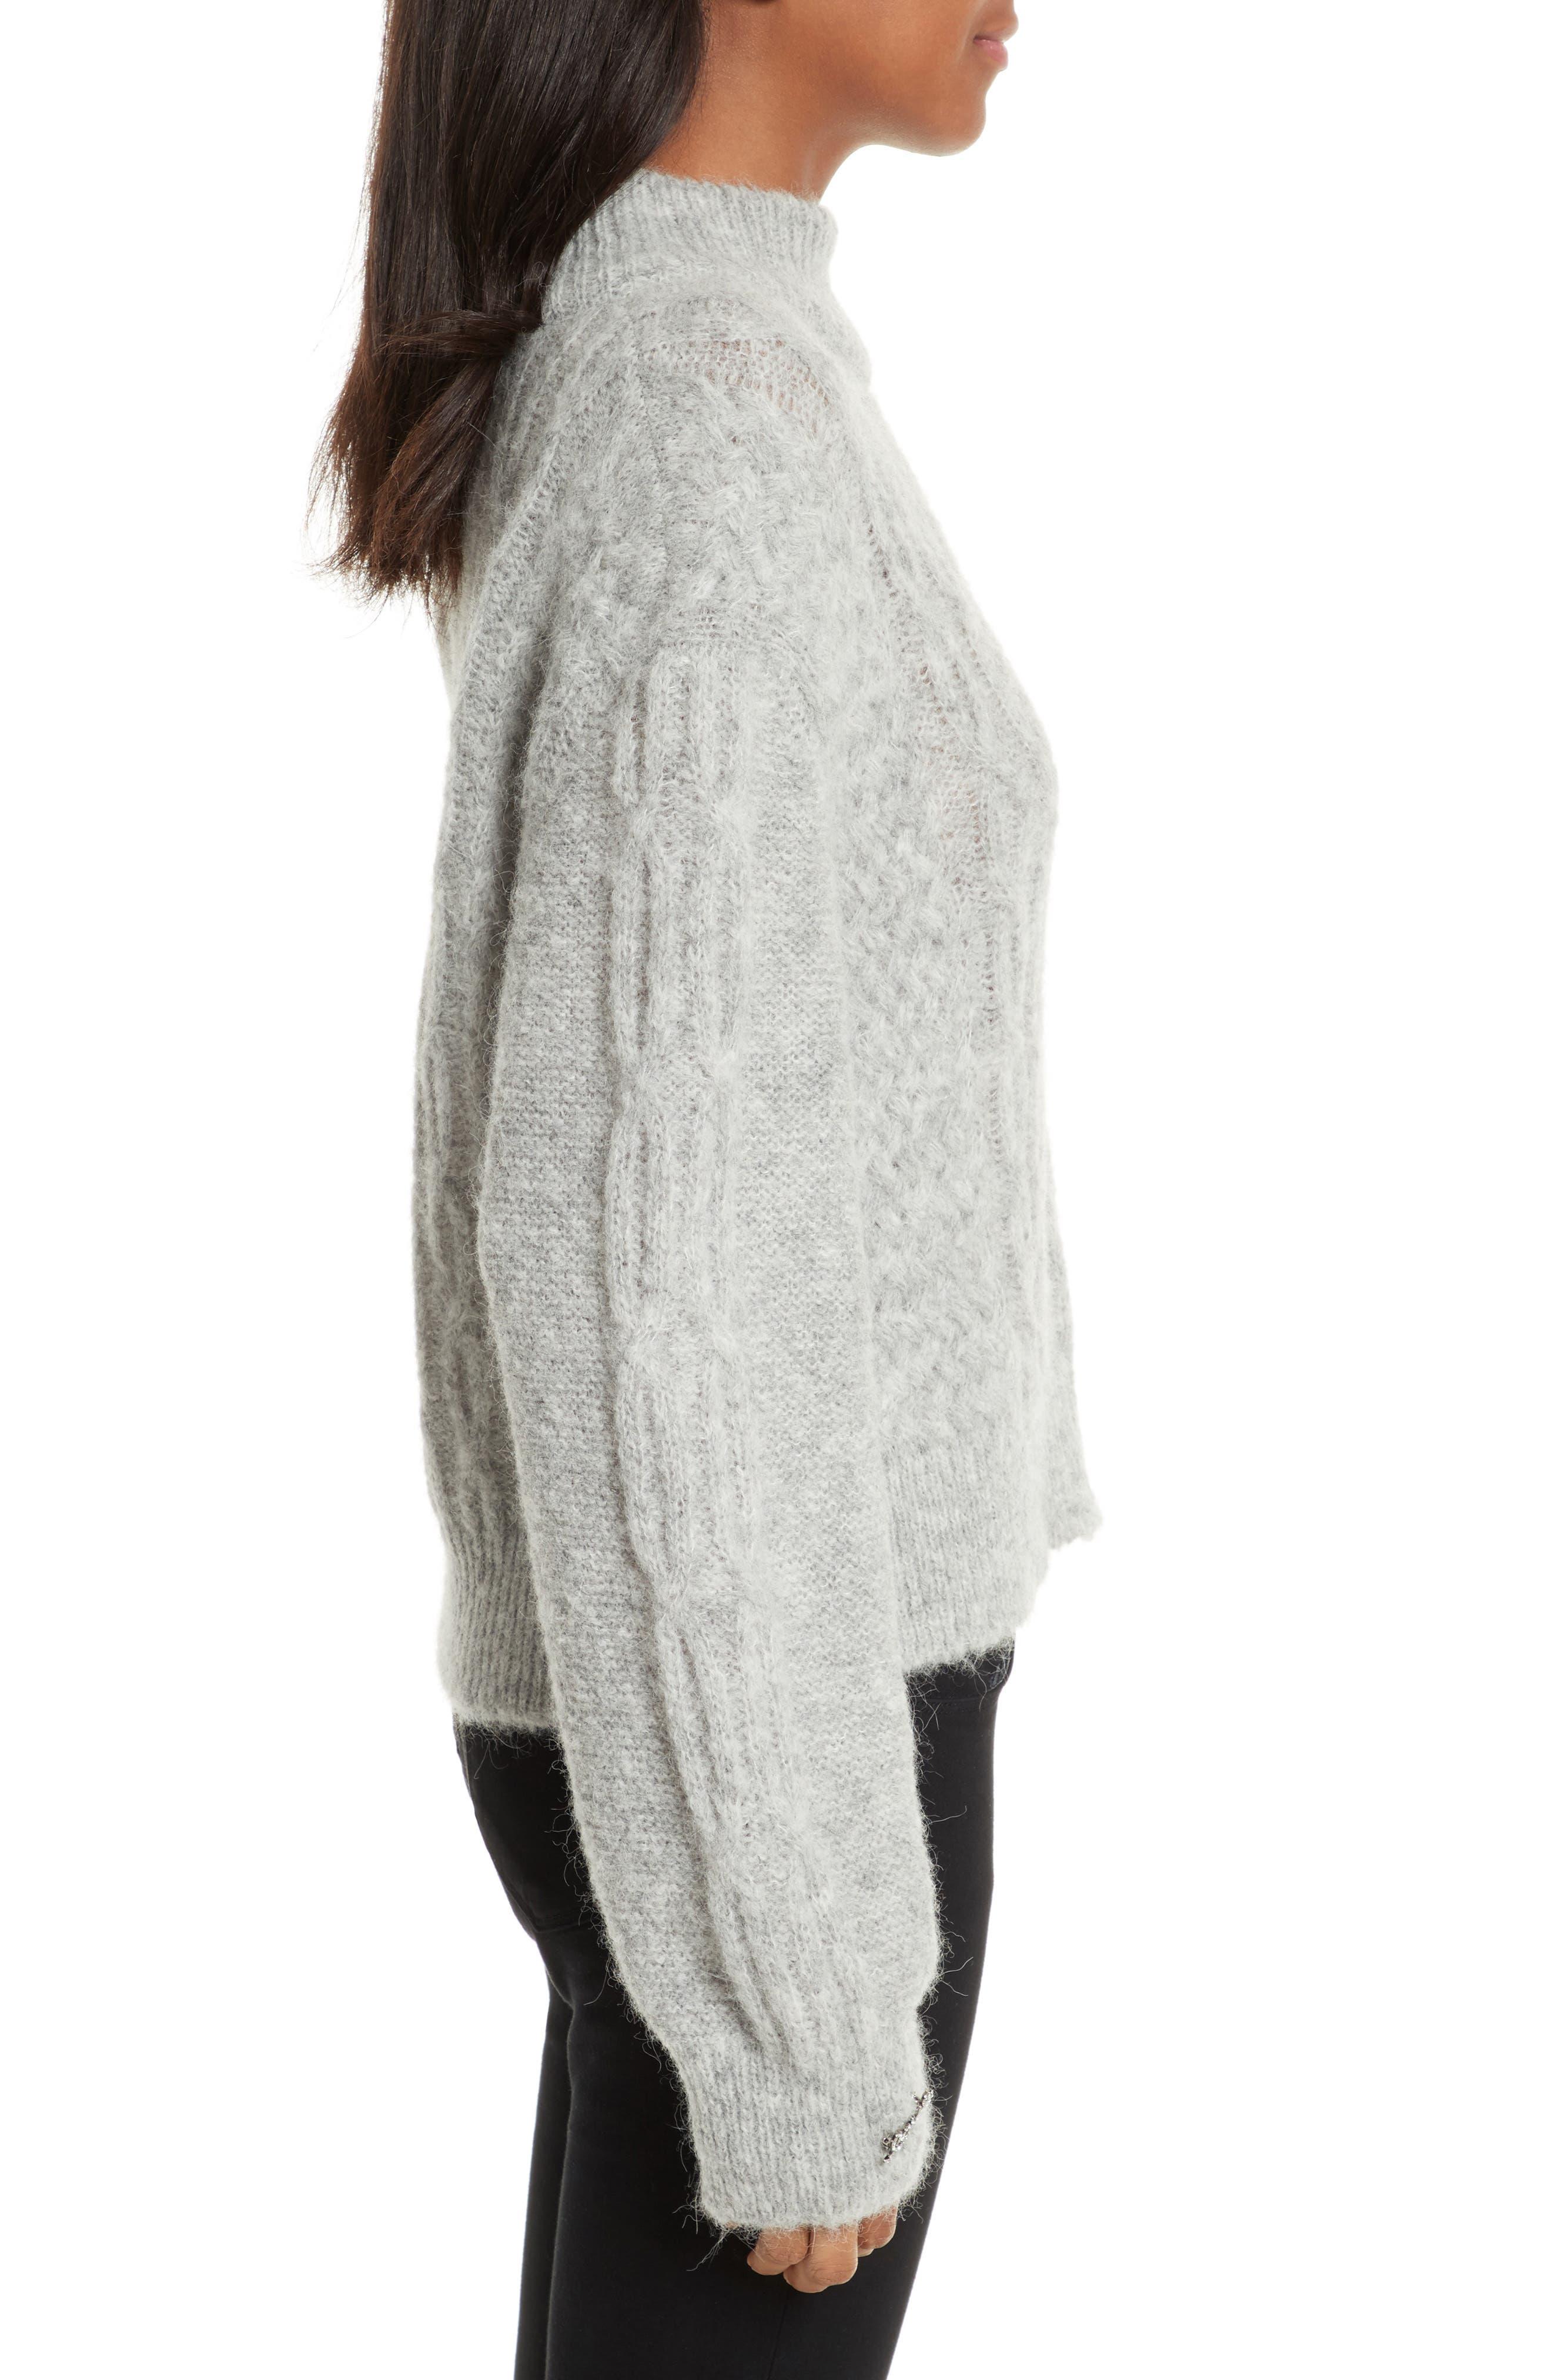 Garlan Mock Neck Sweater,                             Alternate thumbnail 3, color,                             051